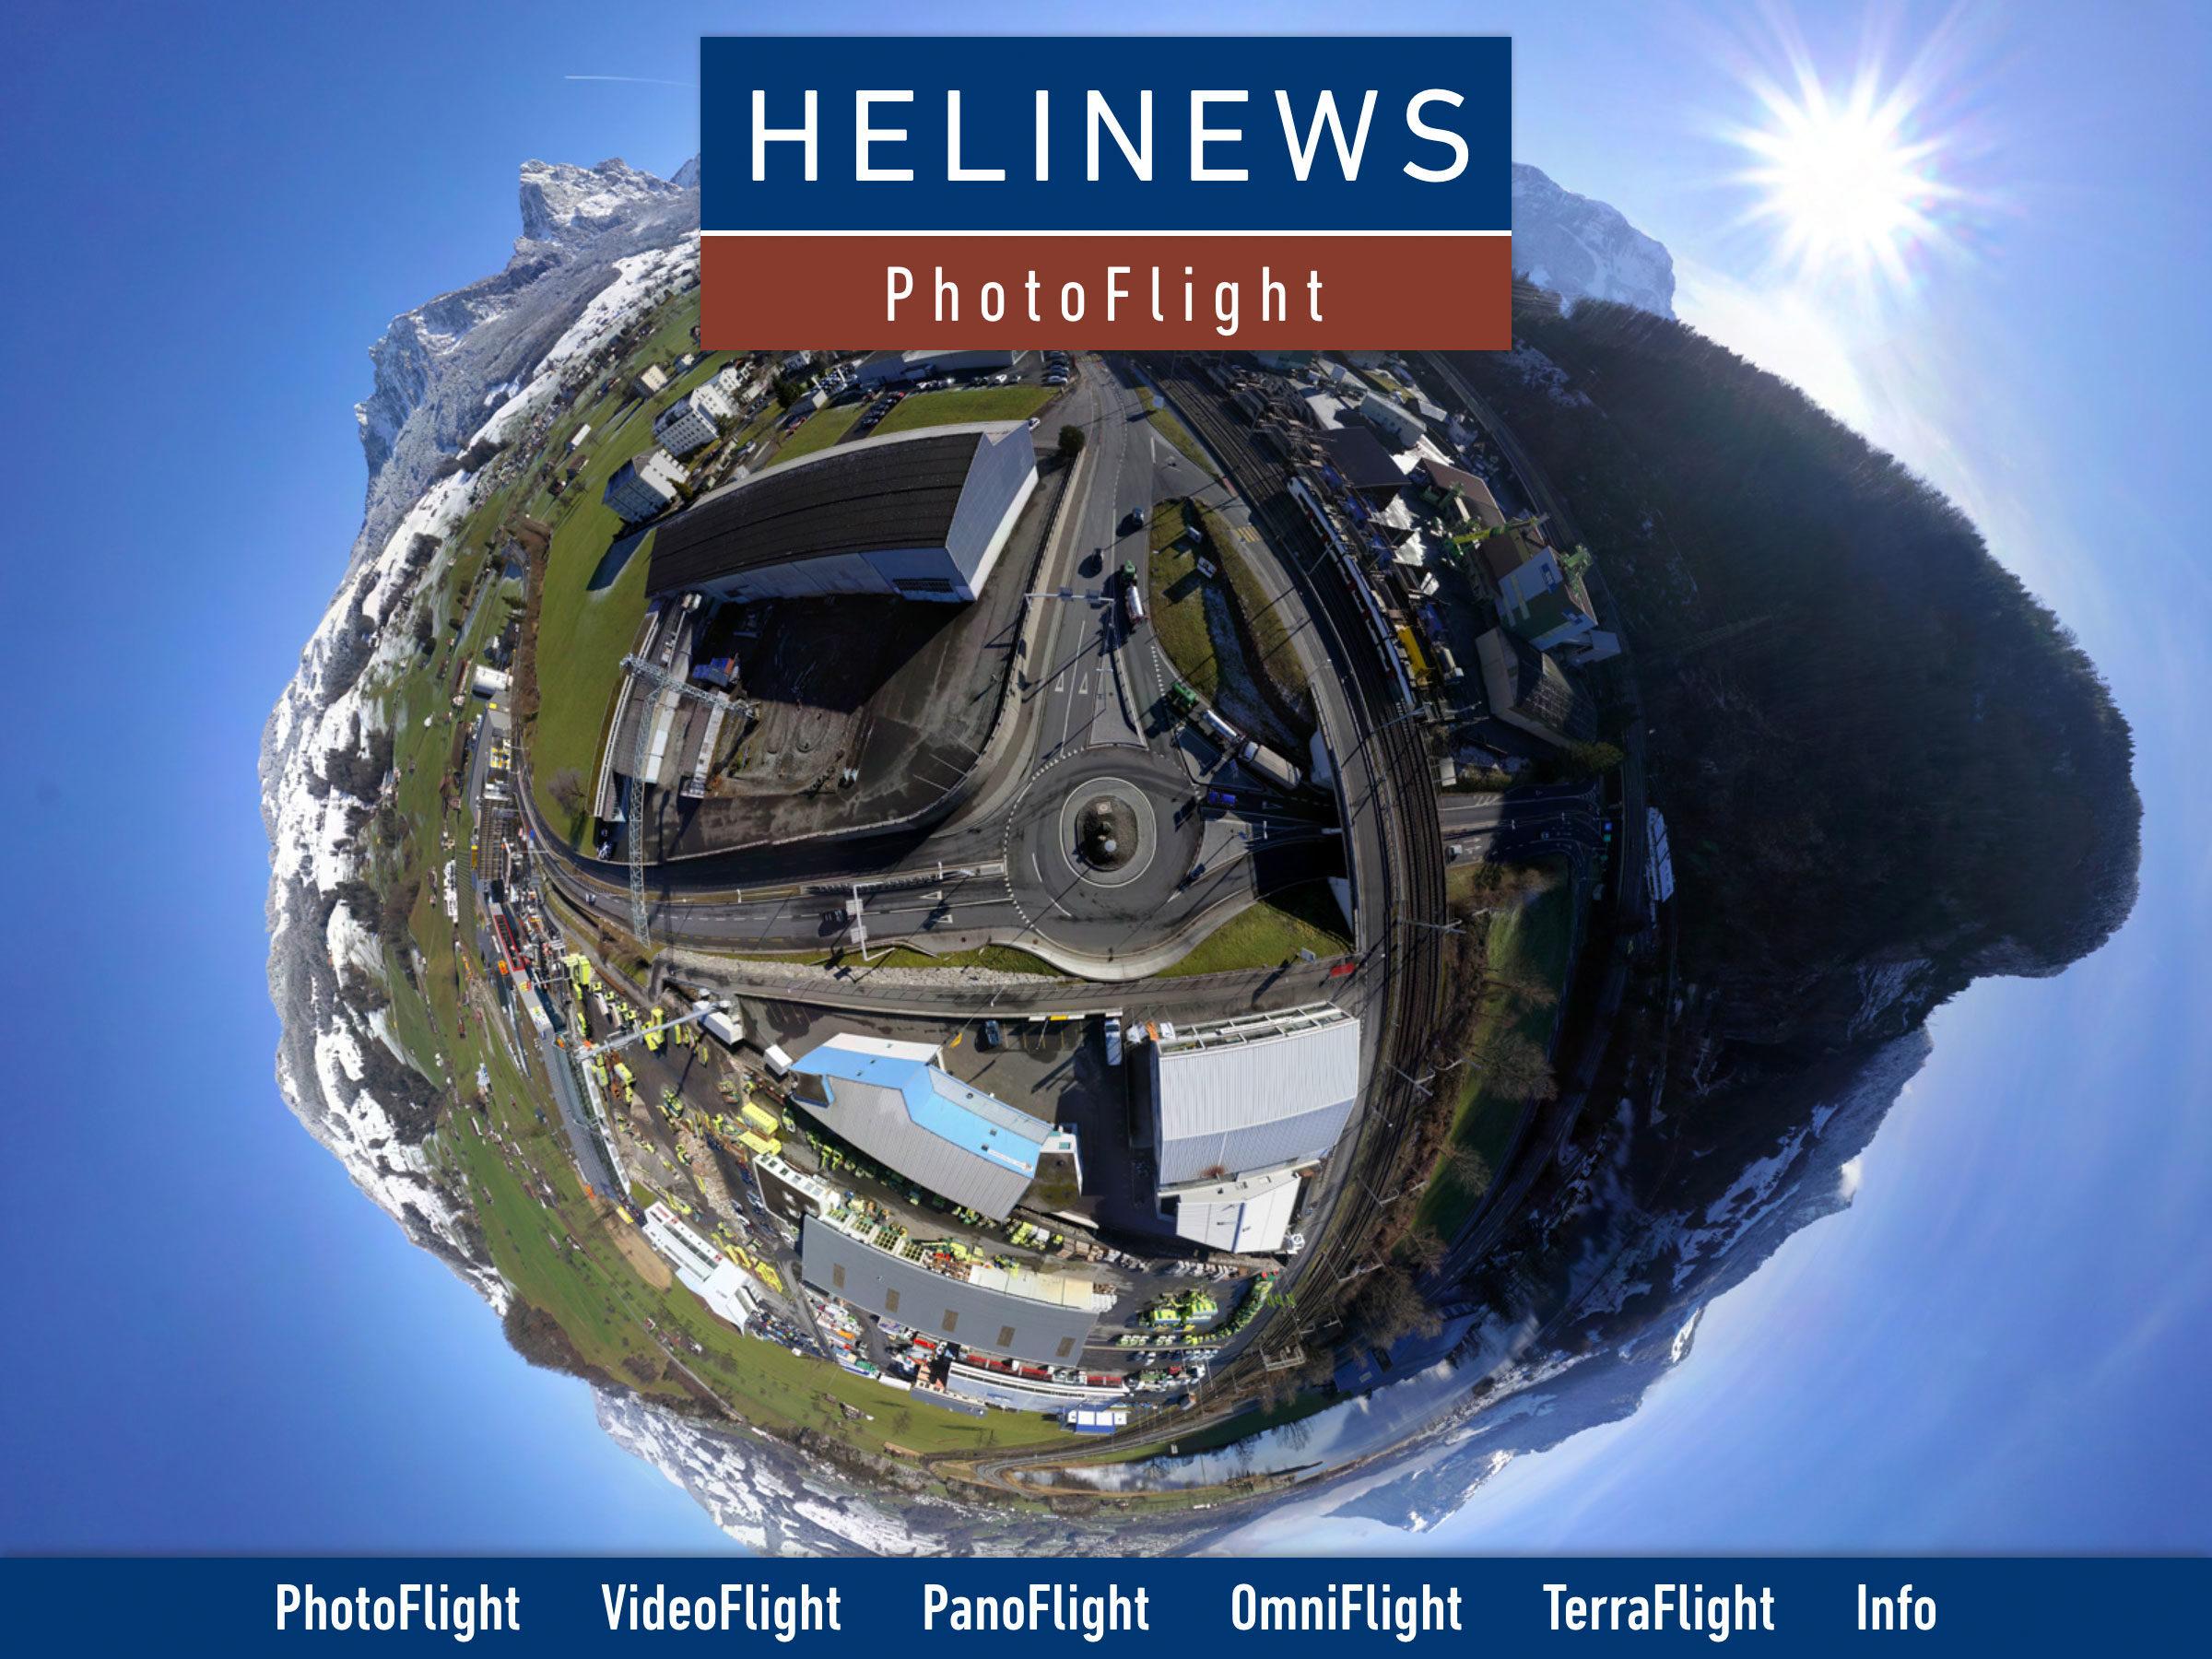 Helinews